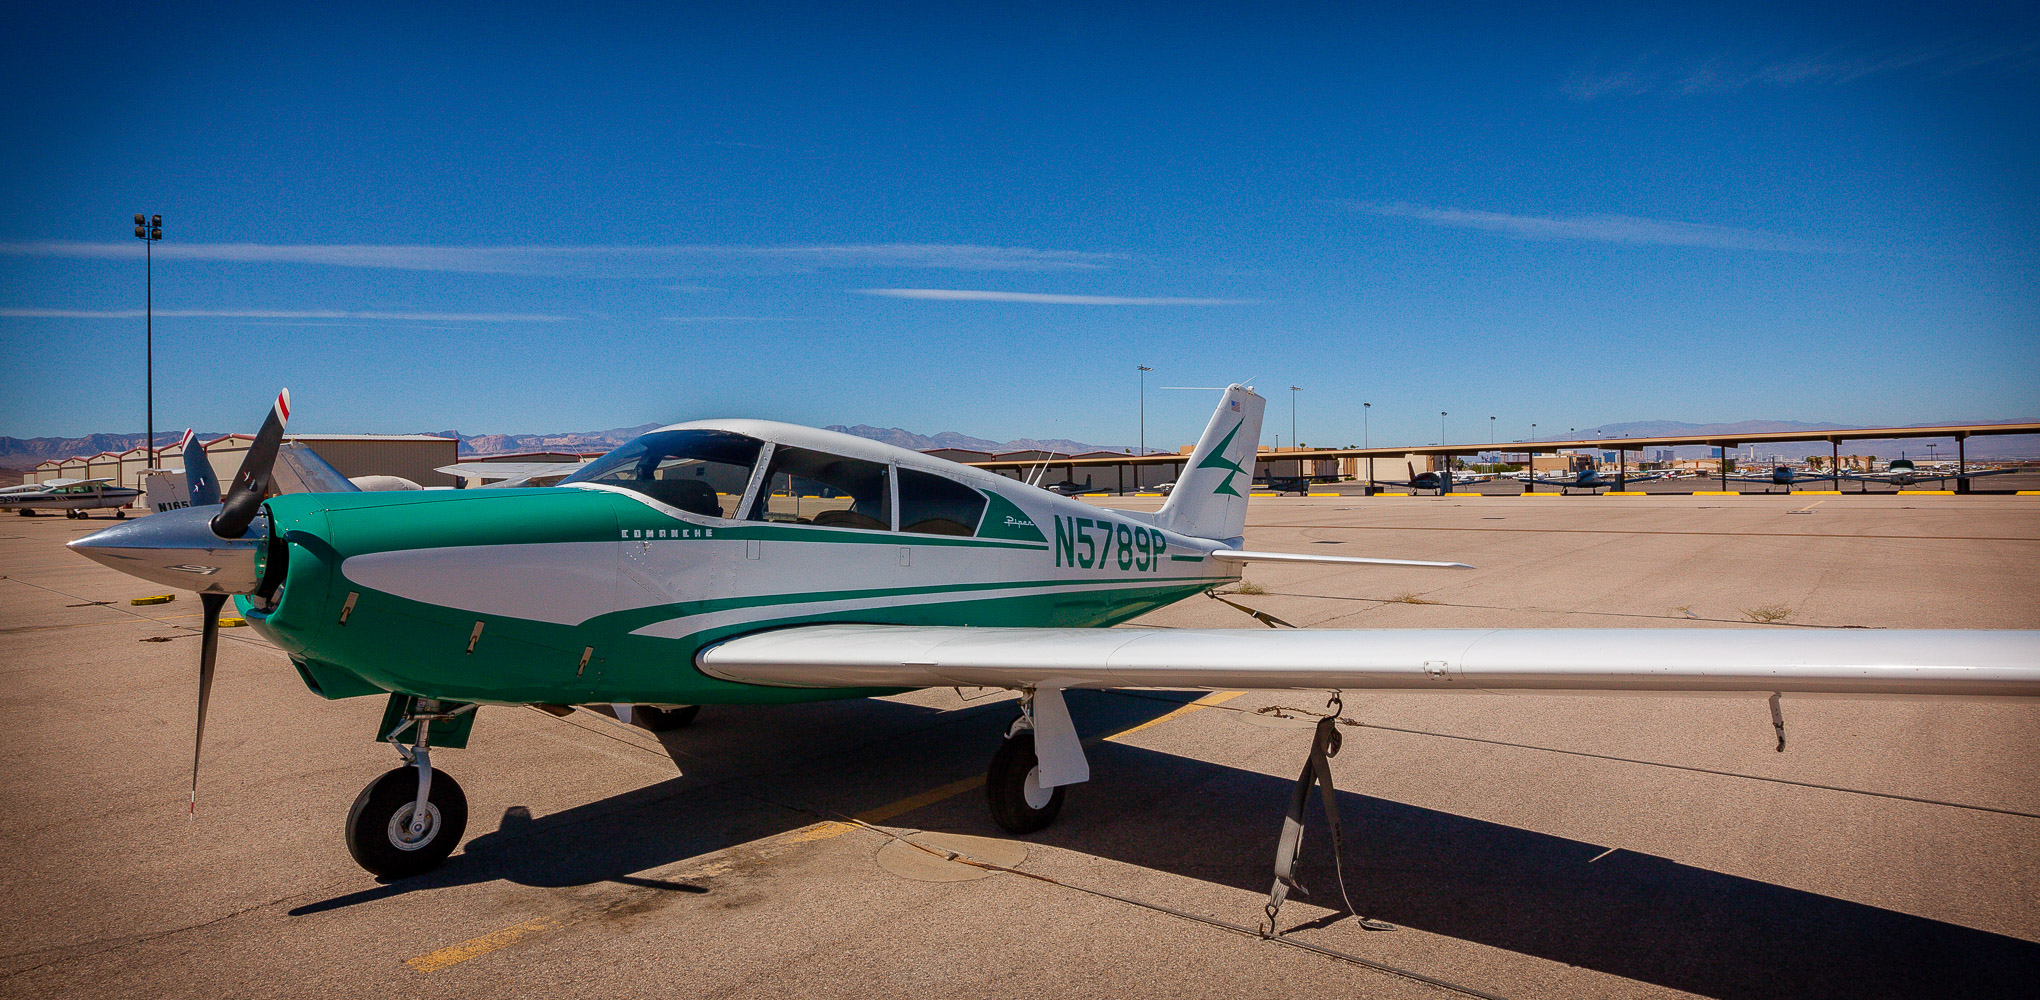 Desert Flying Club Aircraft Rental Las Vegas - Aircraft